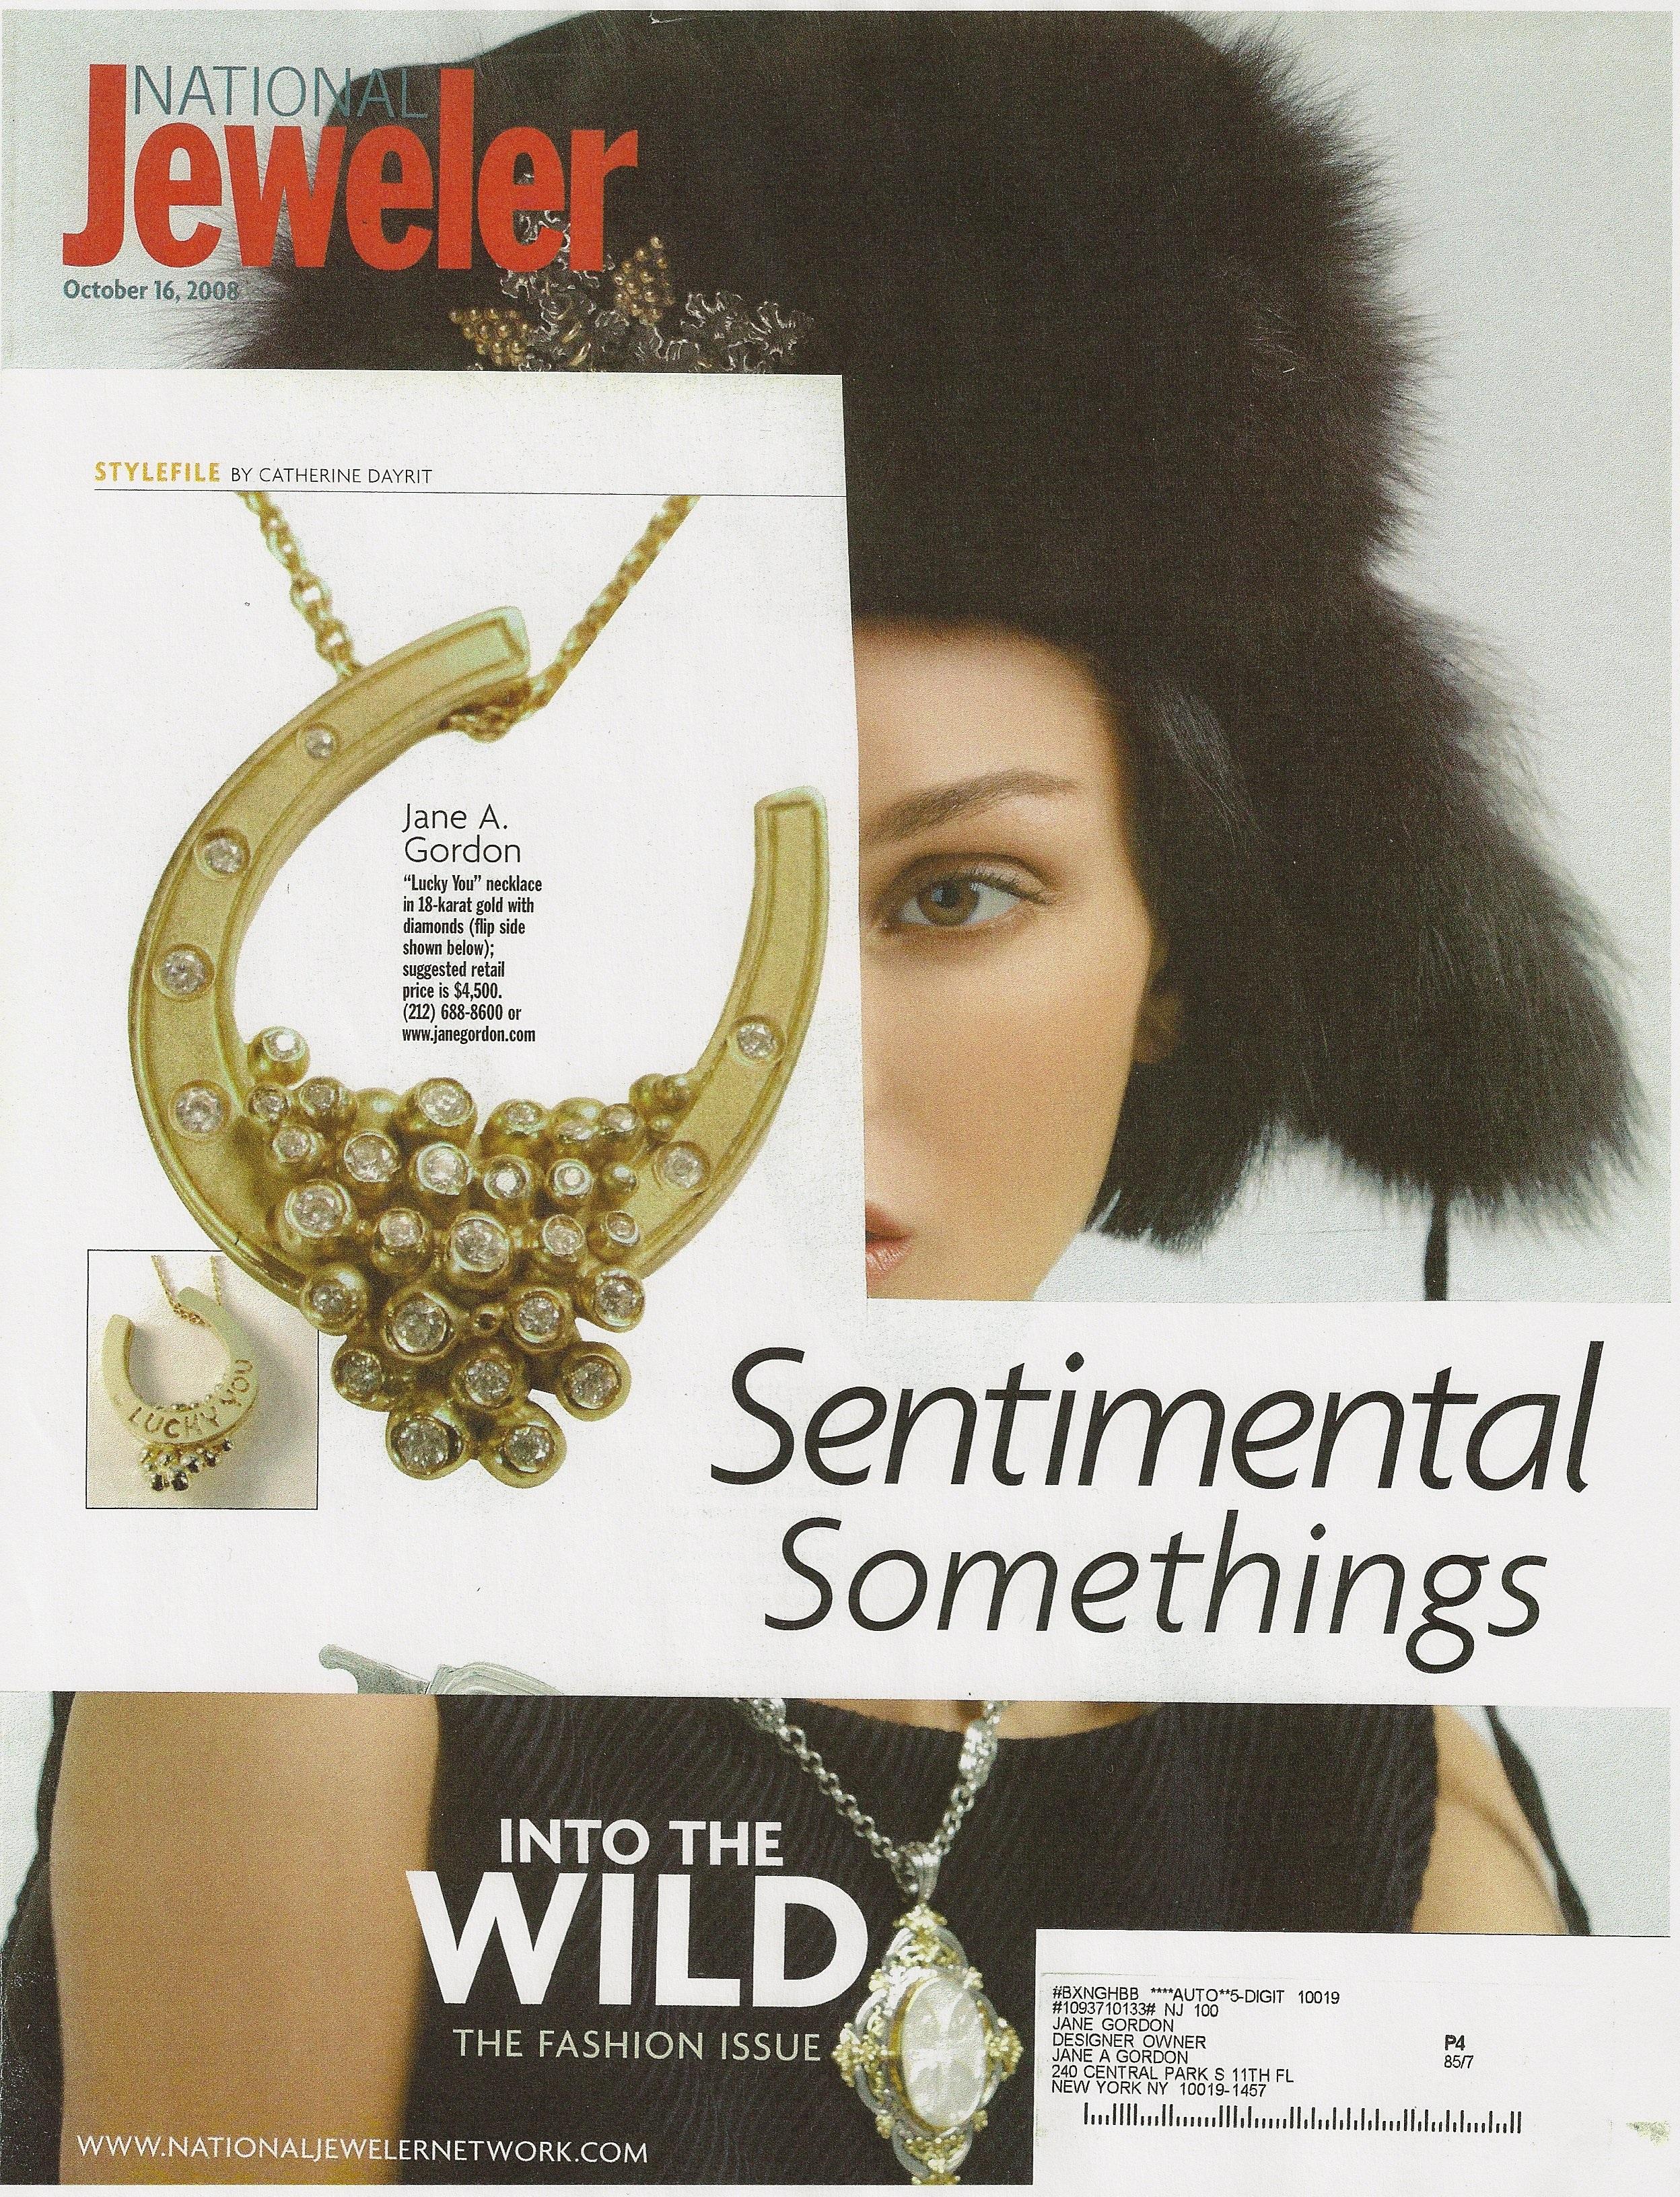 national-jeweler-equestrian-jewelry-at-janegordon-com-jane-a-gordon.jpg